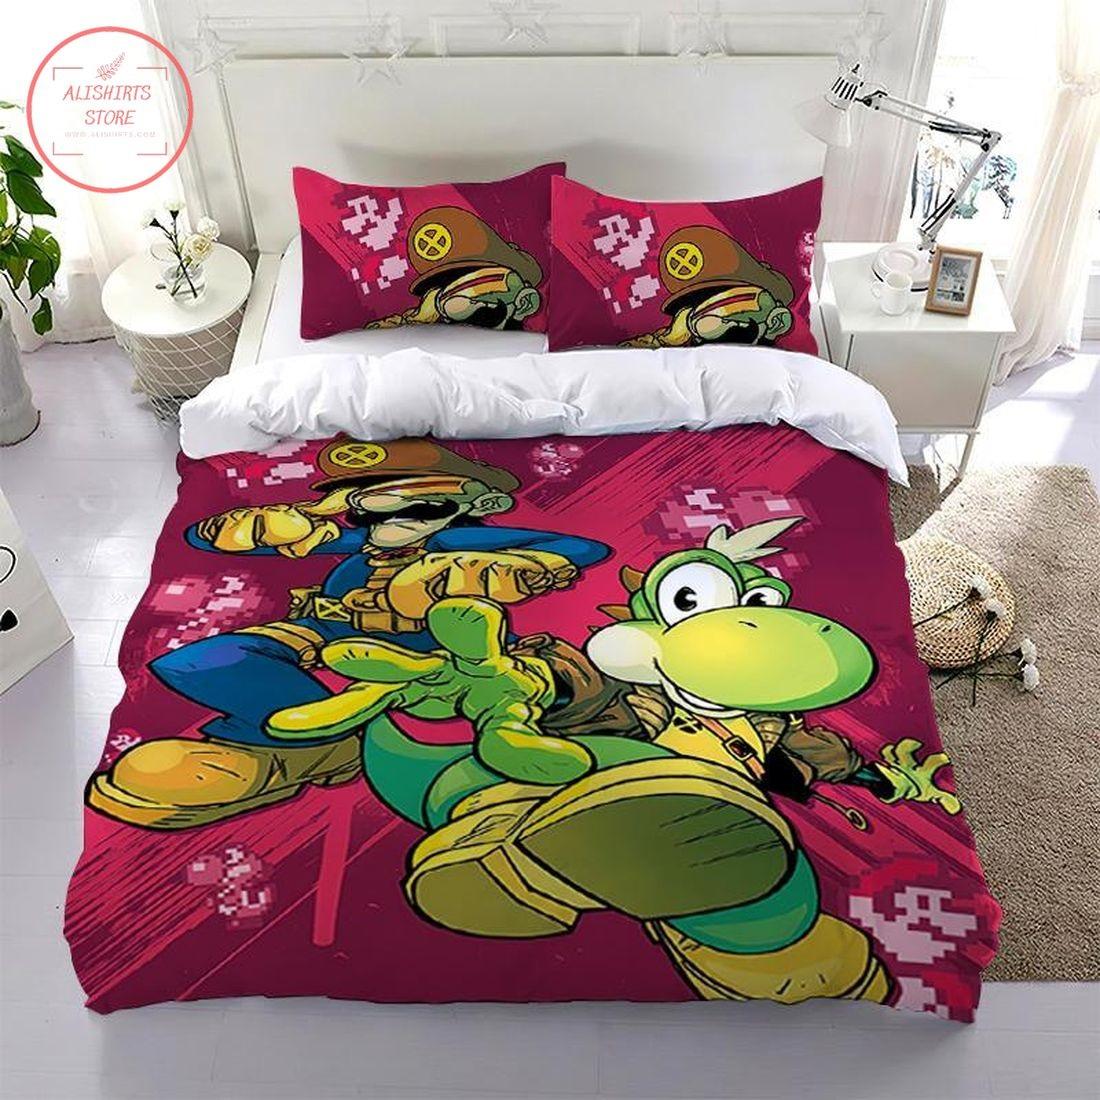 Super Mario Animated Character Bedding Set